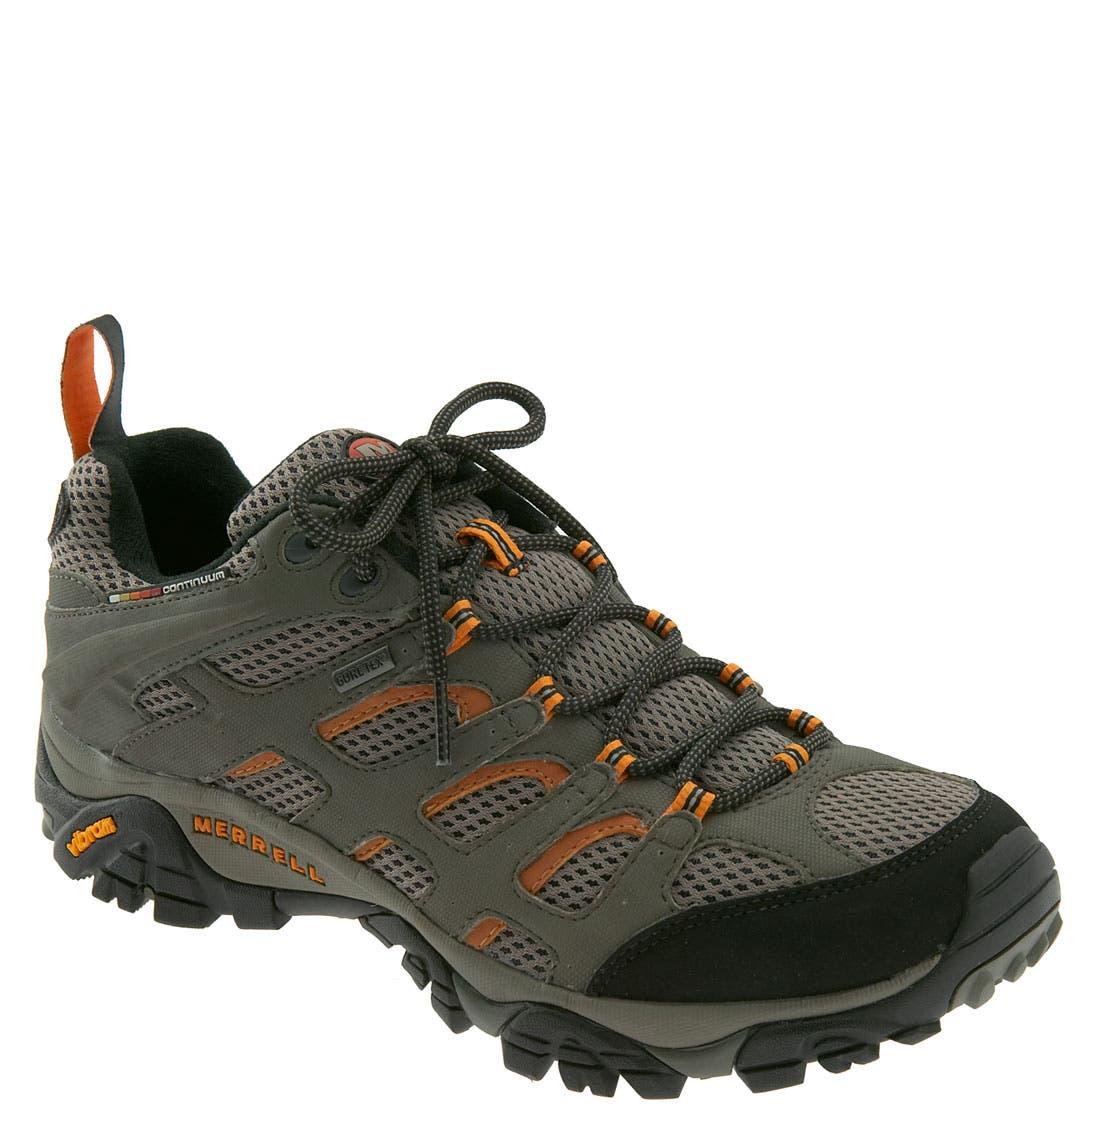 Alternate Image 1 Selected - Merrell 'Moab GTX XCR' Hiking Shoe (Men)